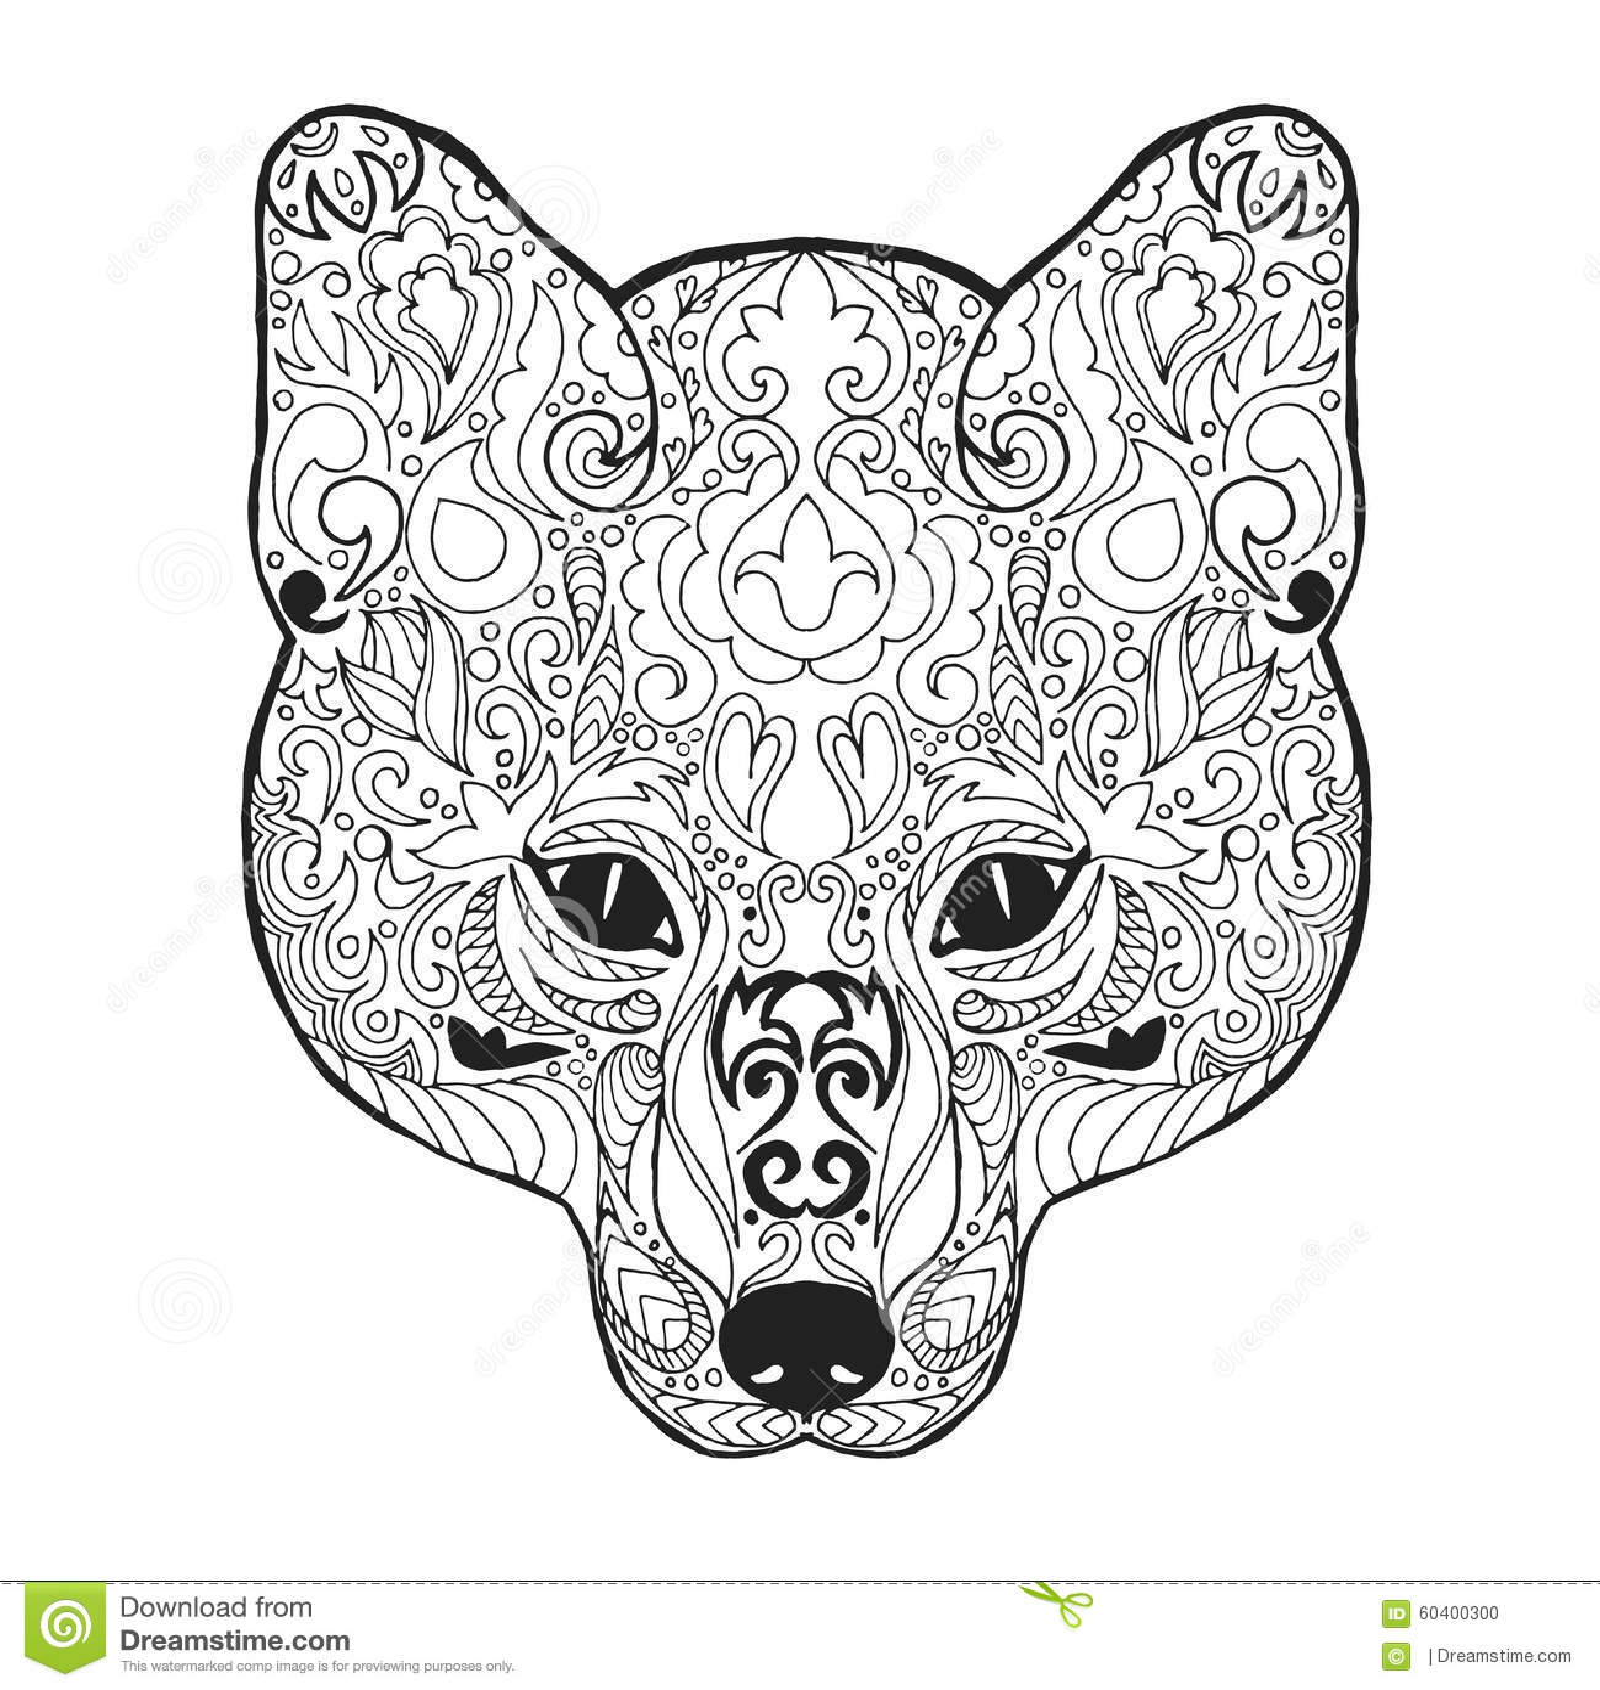 Zentangle Stylized Fox Head Sketch For Tattoo Or T Shirt